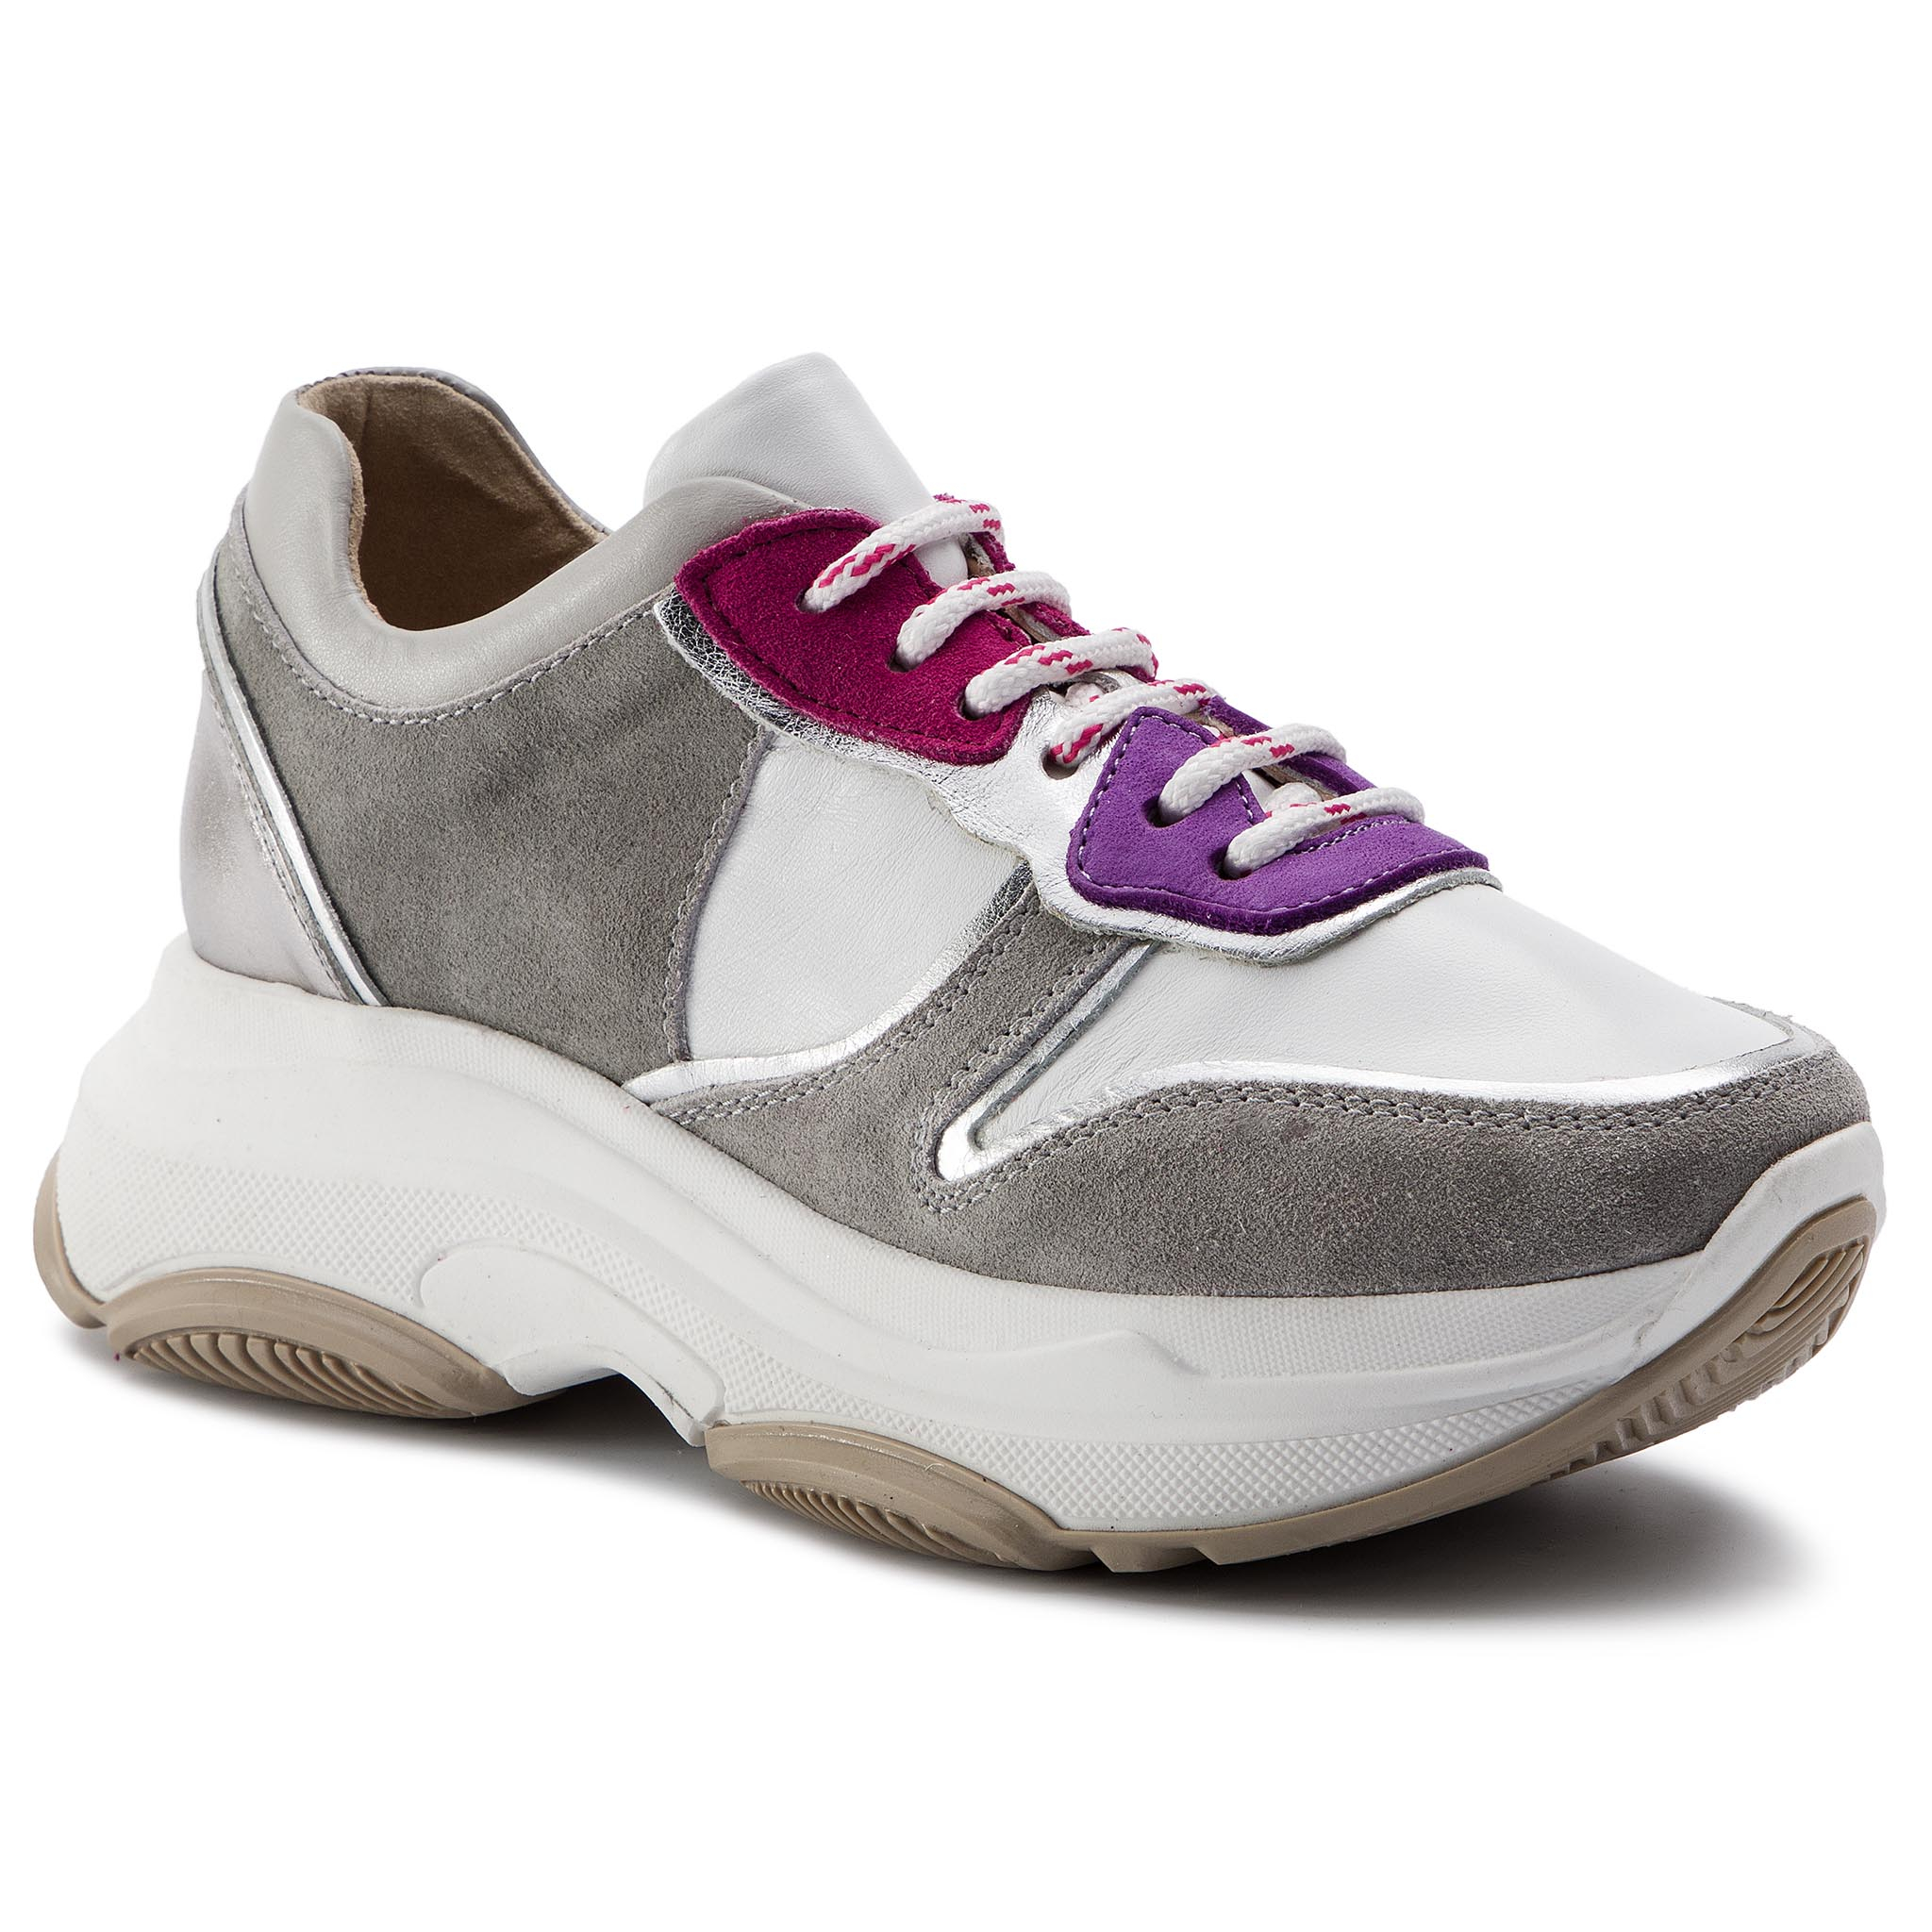 Image of Sneakers EVA MINGE - EM-11-05-000047 112